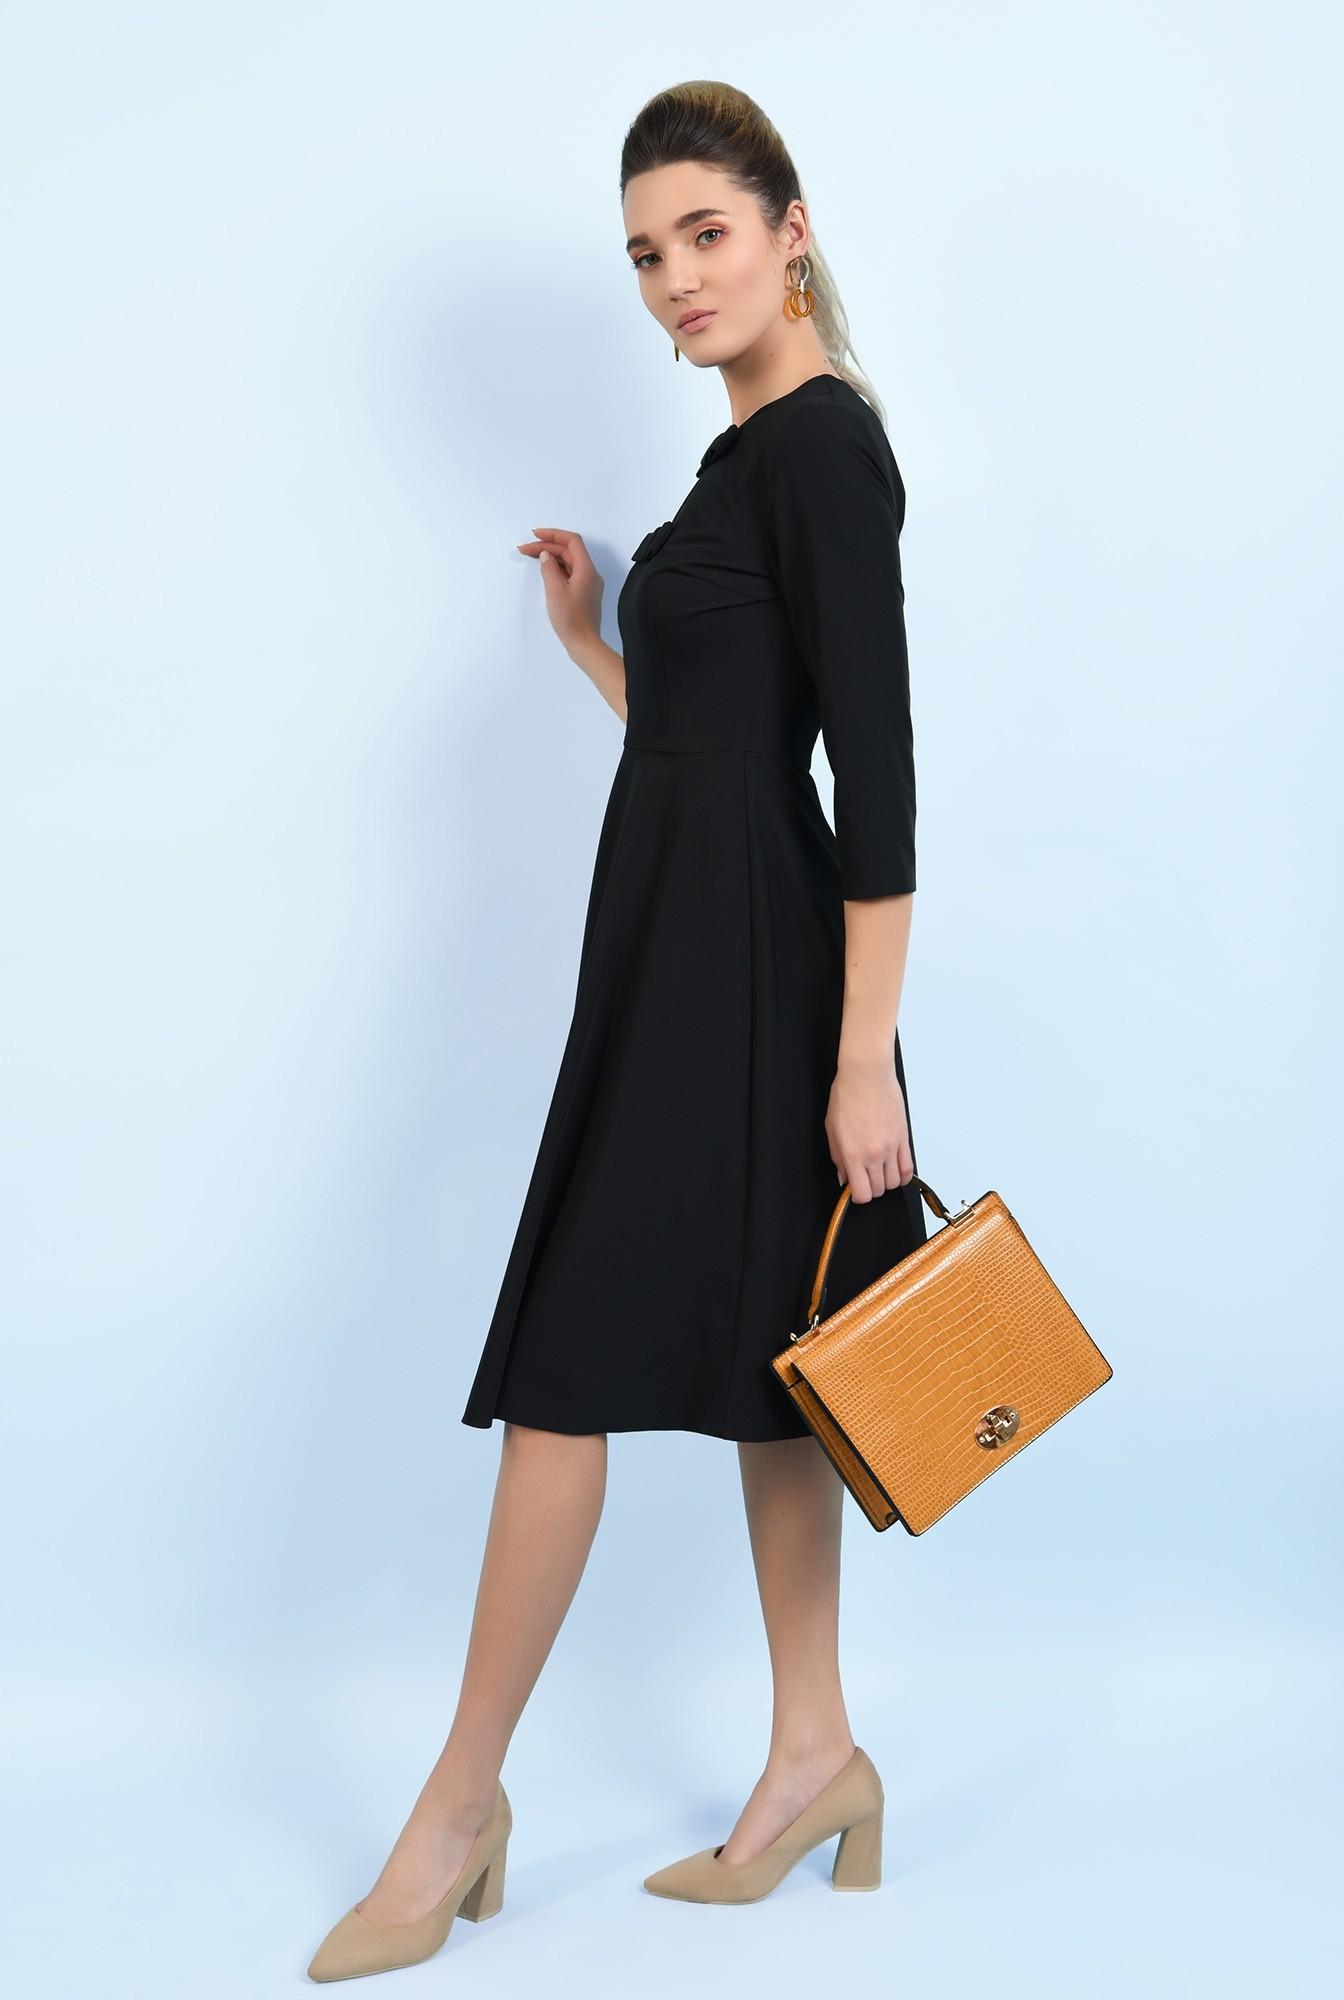 3 - 360 - rochie neagra, evazata, cu funde, rochie office, midi